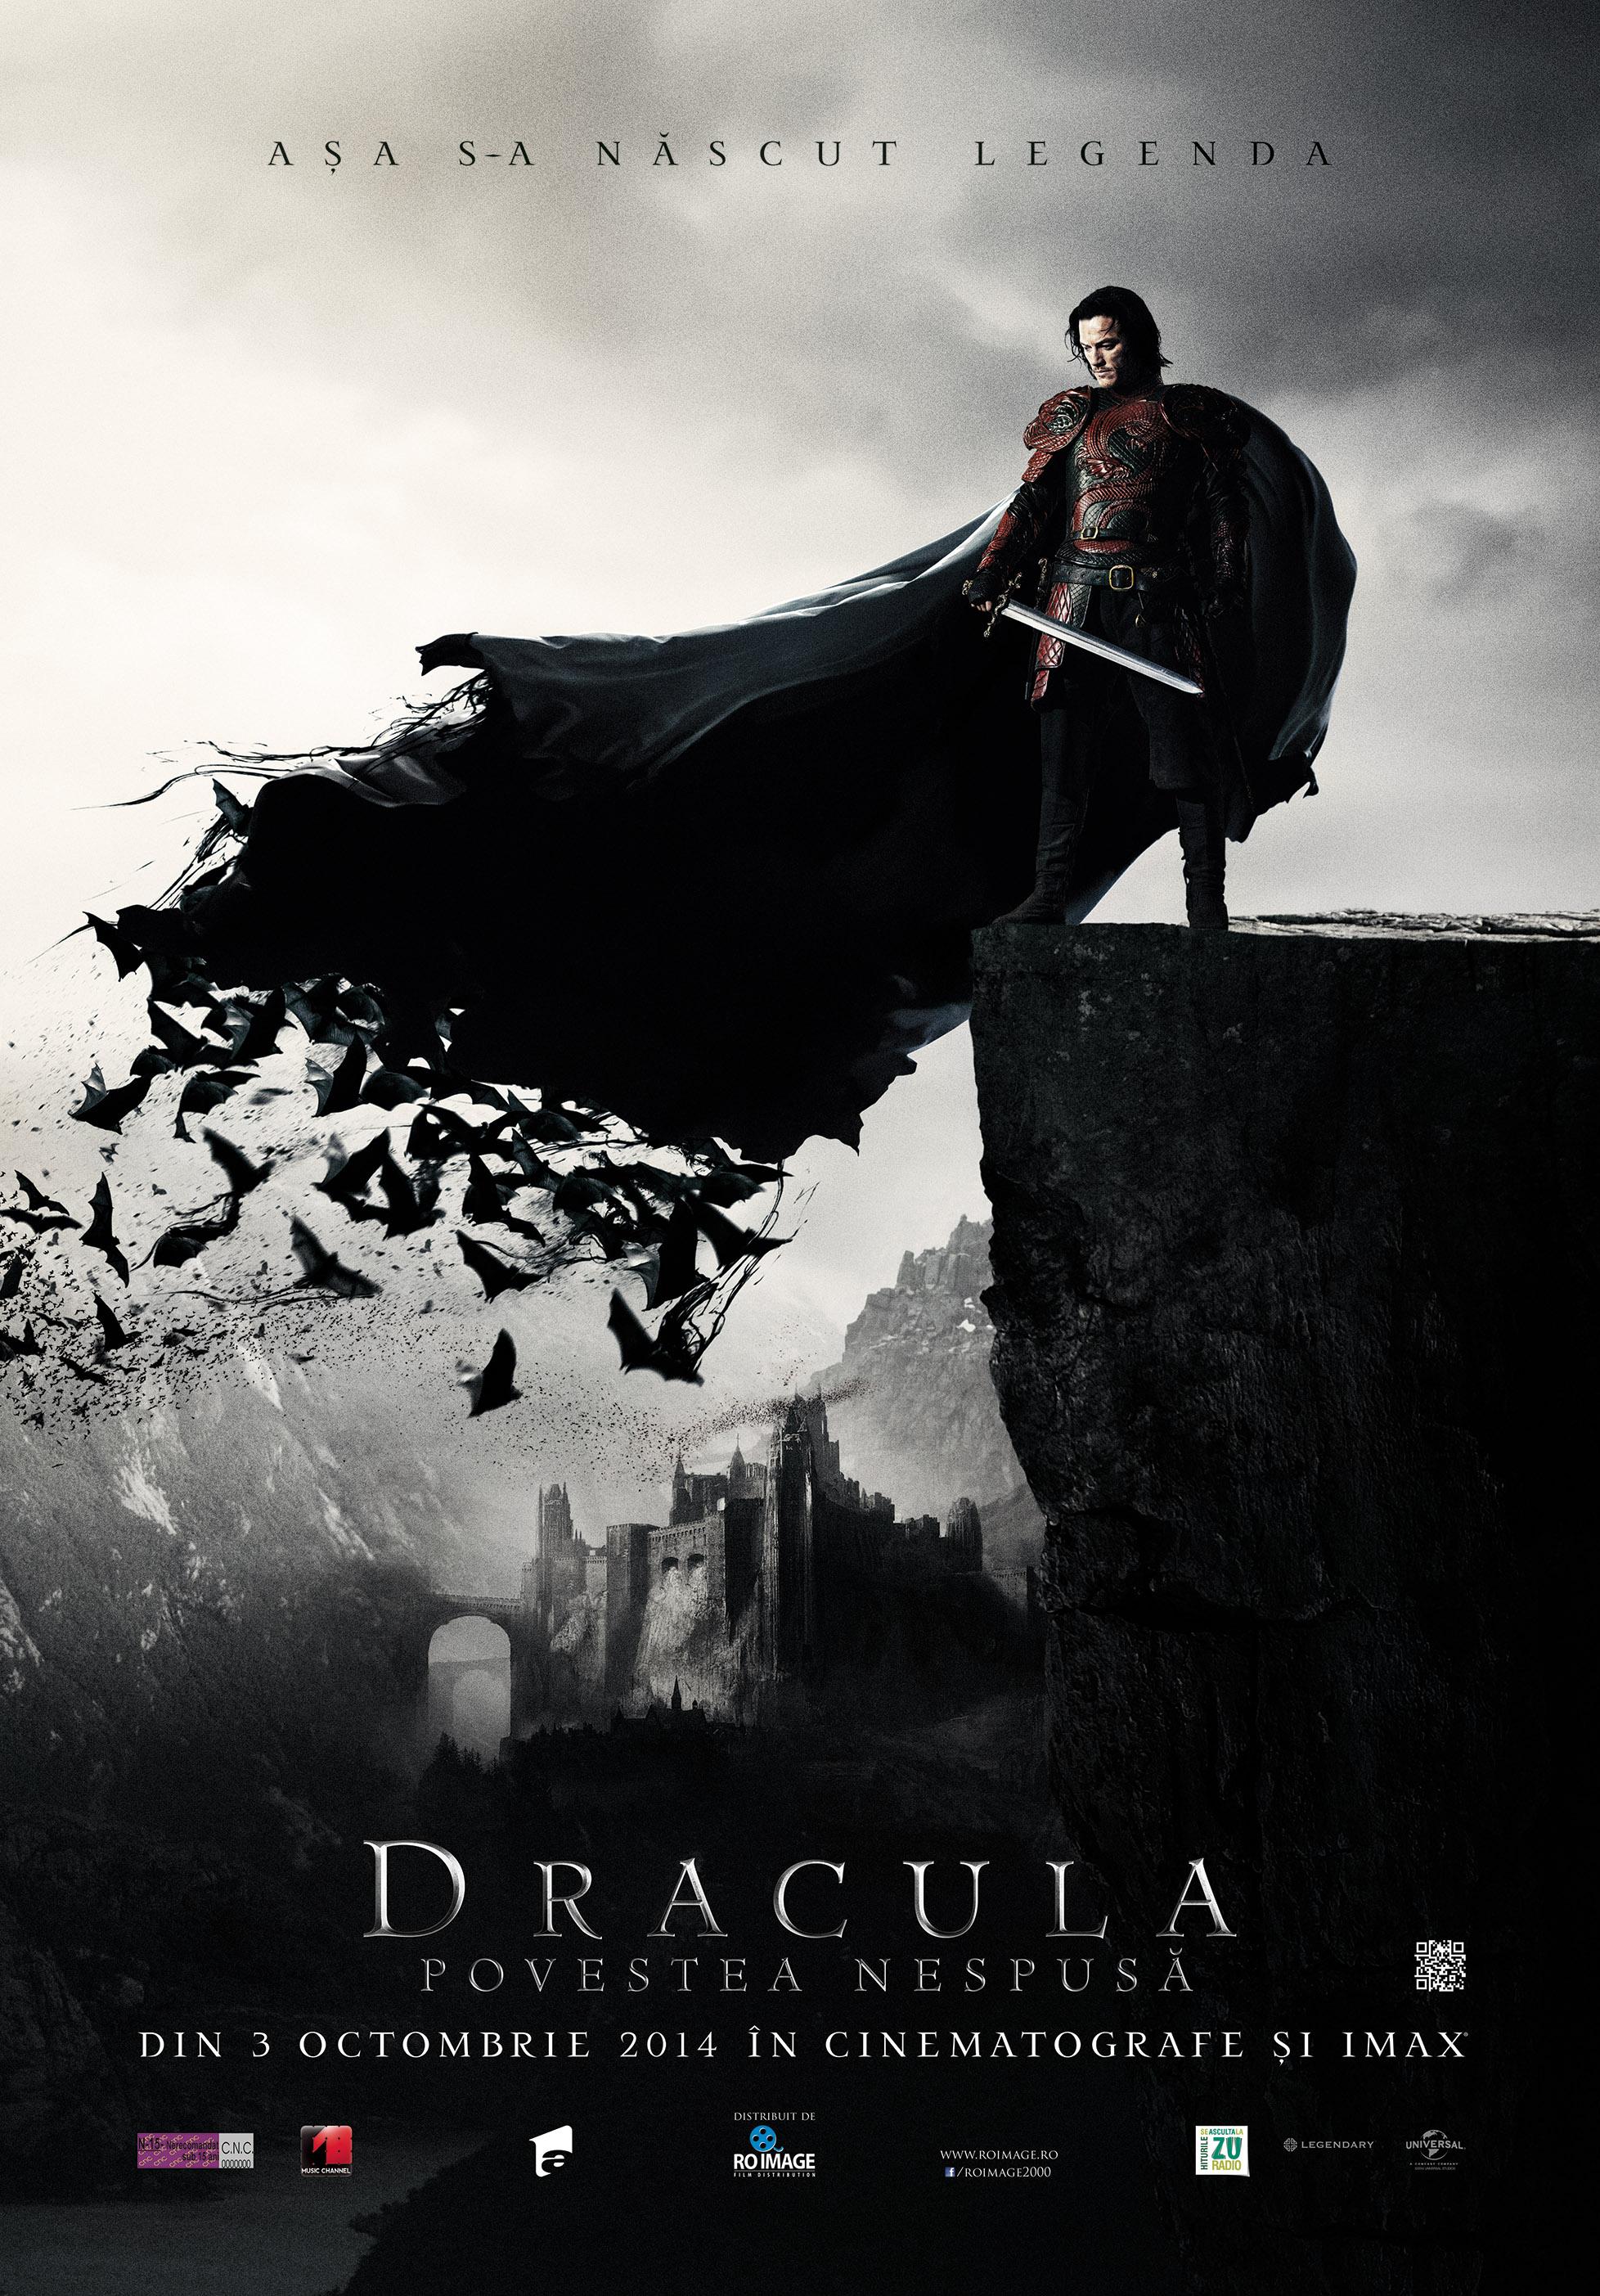 Dracula: Povestea nespusa / Dracula Untold